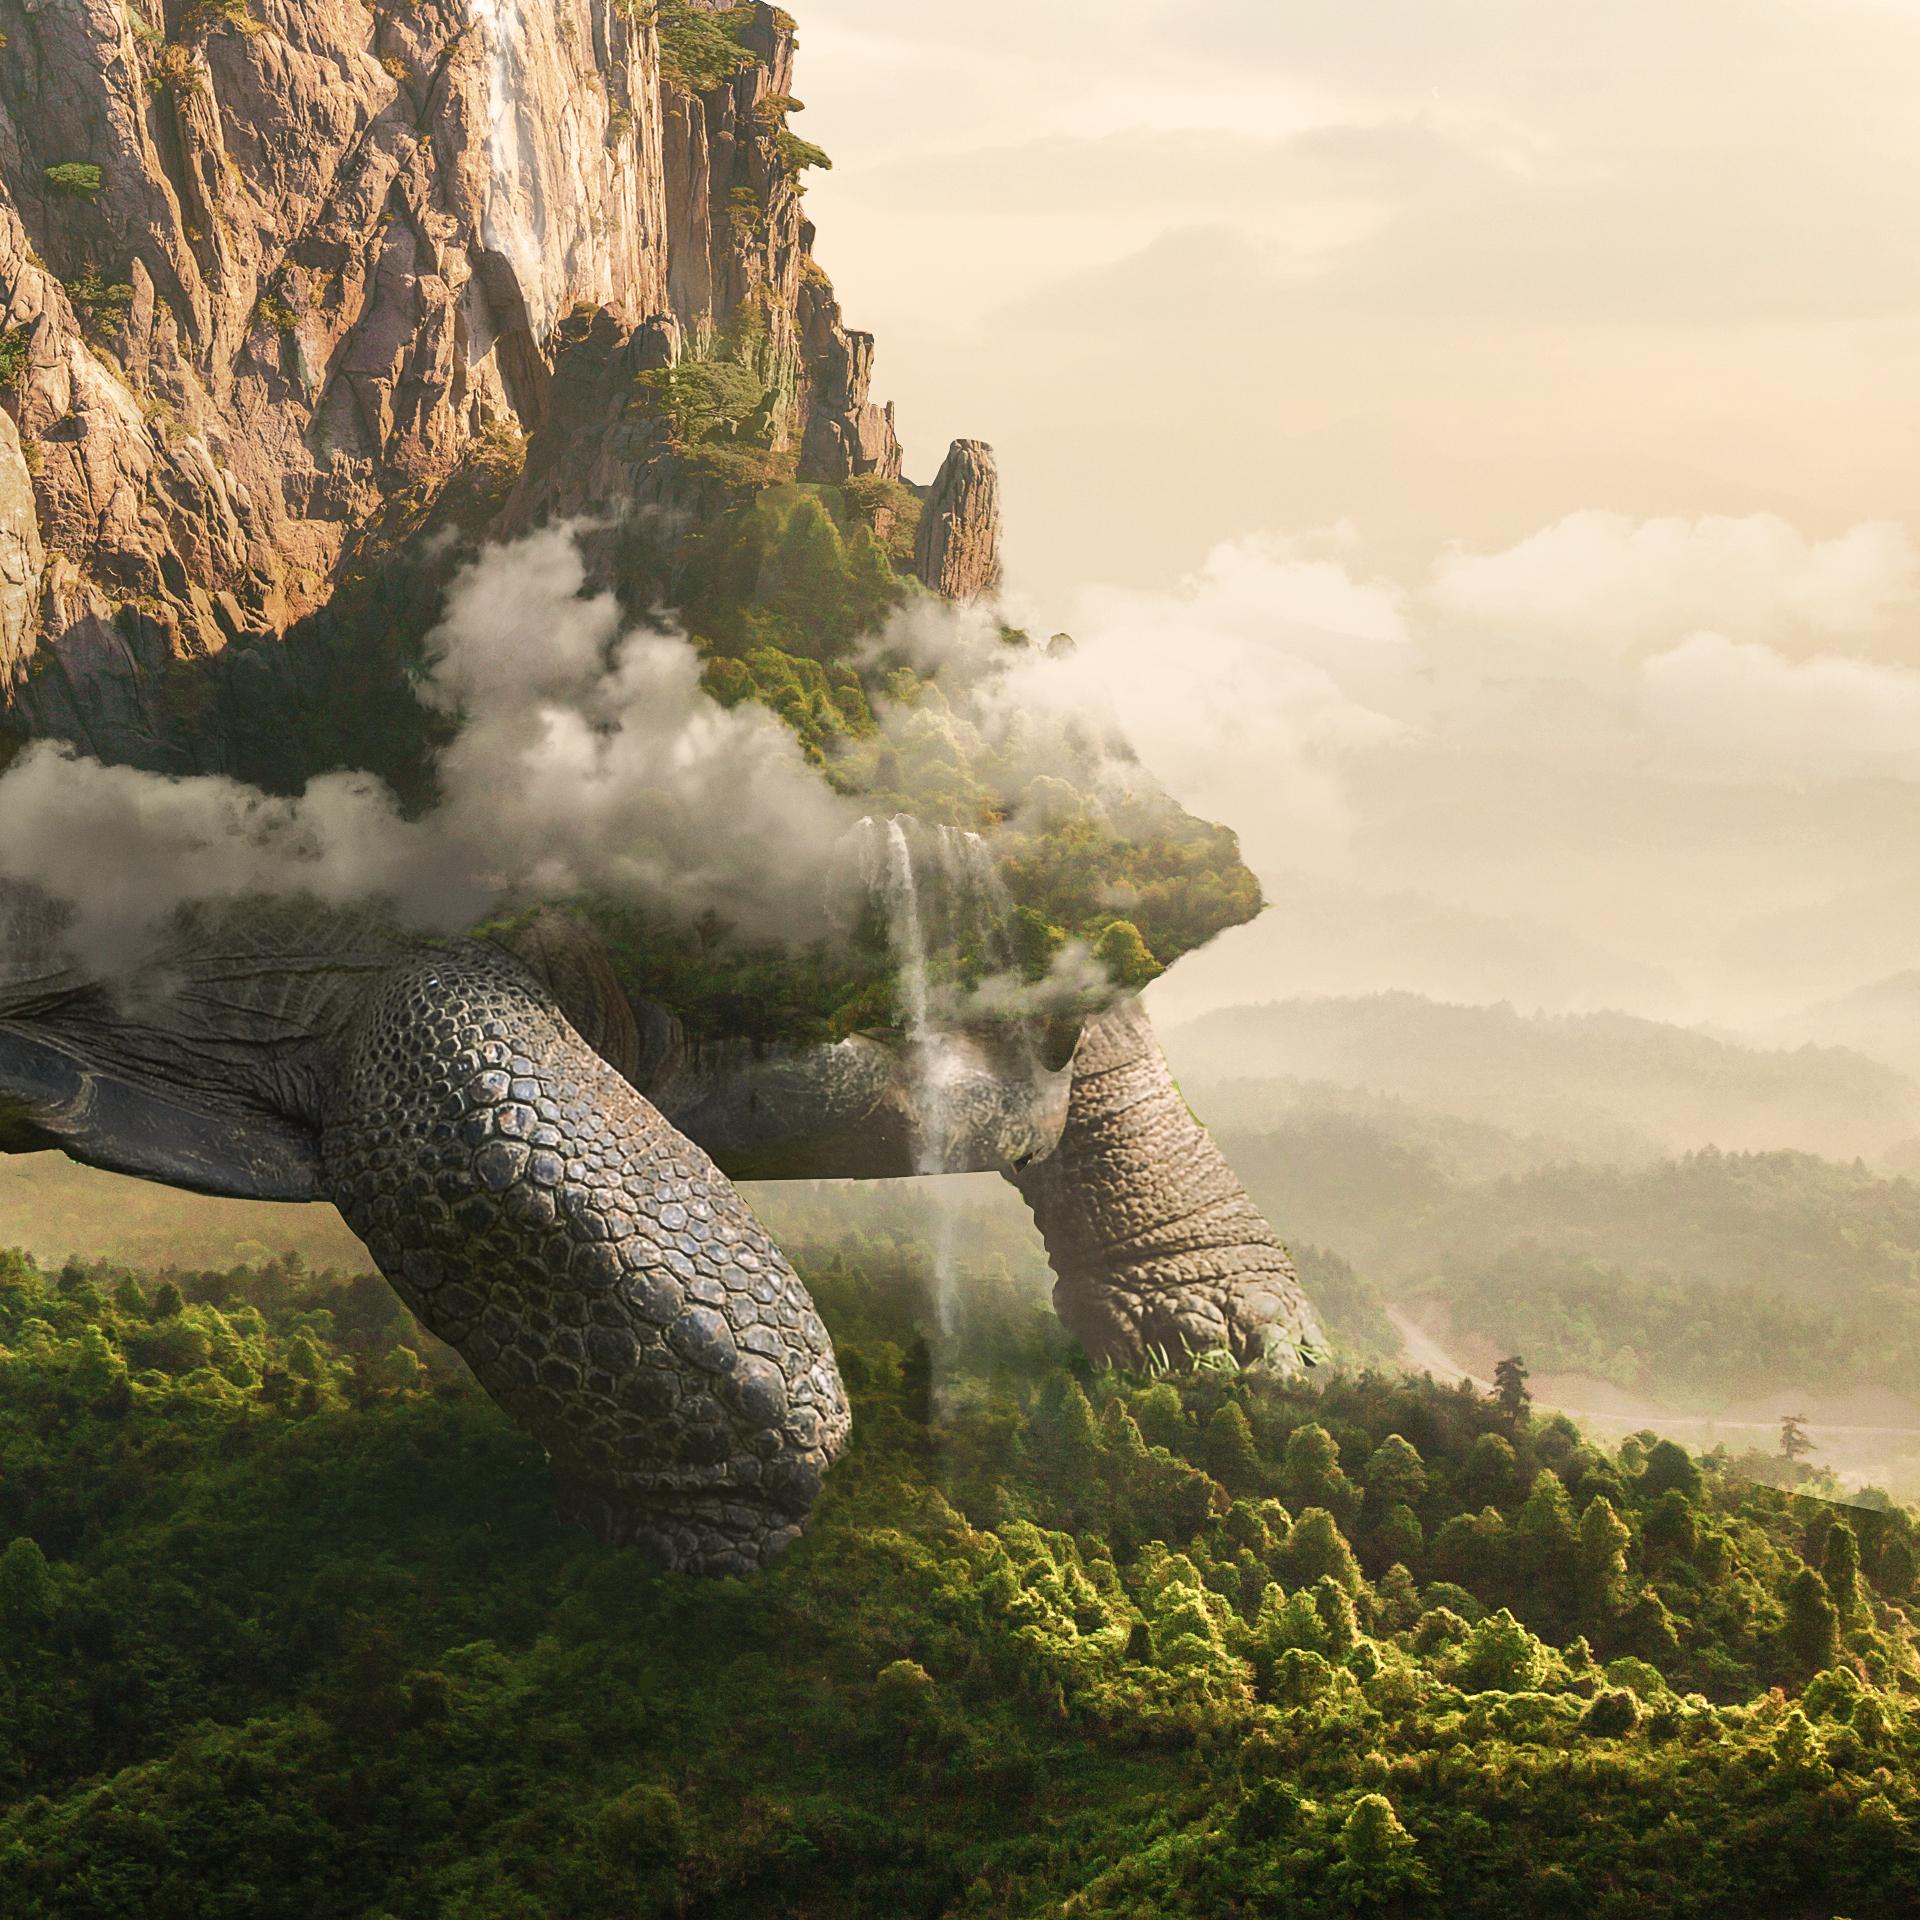 Giant-Tortoise-Close-up-2.jpg